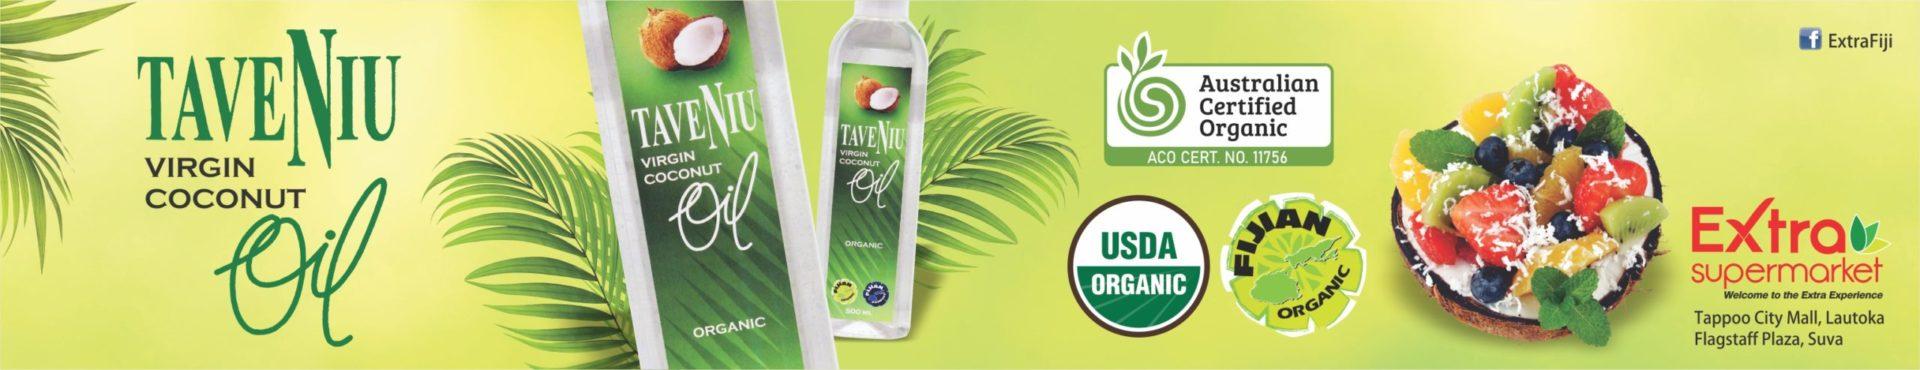 Fiji Premium TaveNiu Virgin Coconut Oil at Extra Supermarket